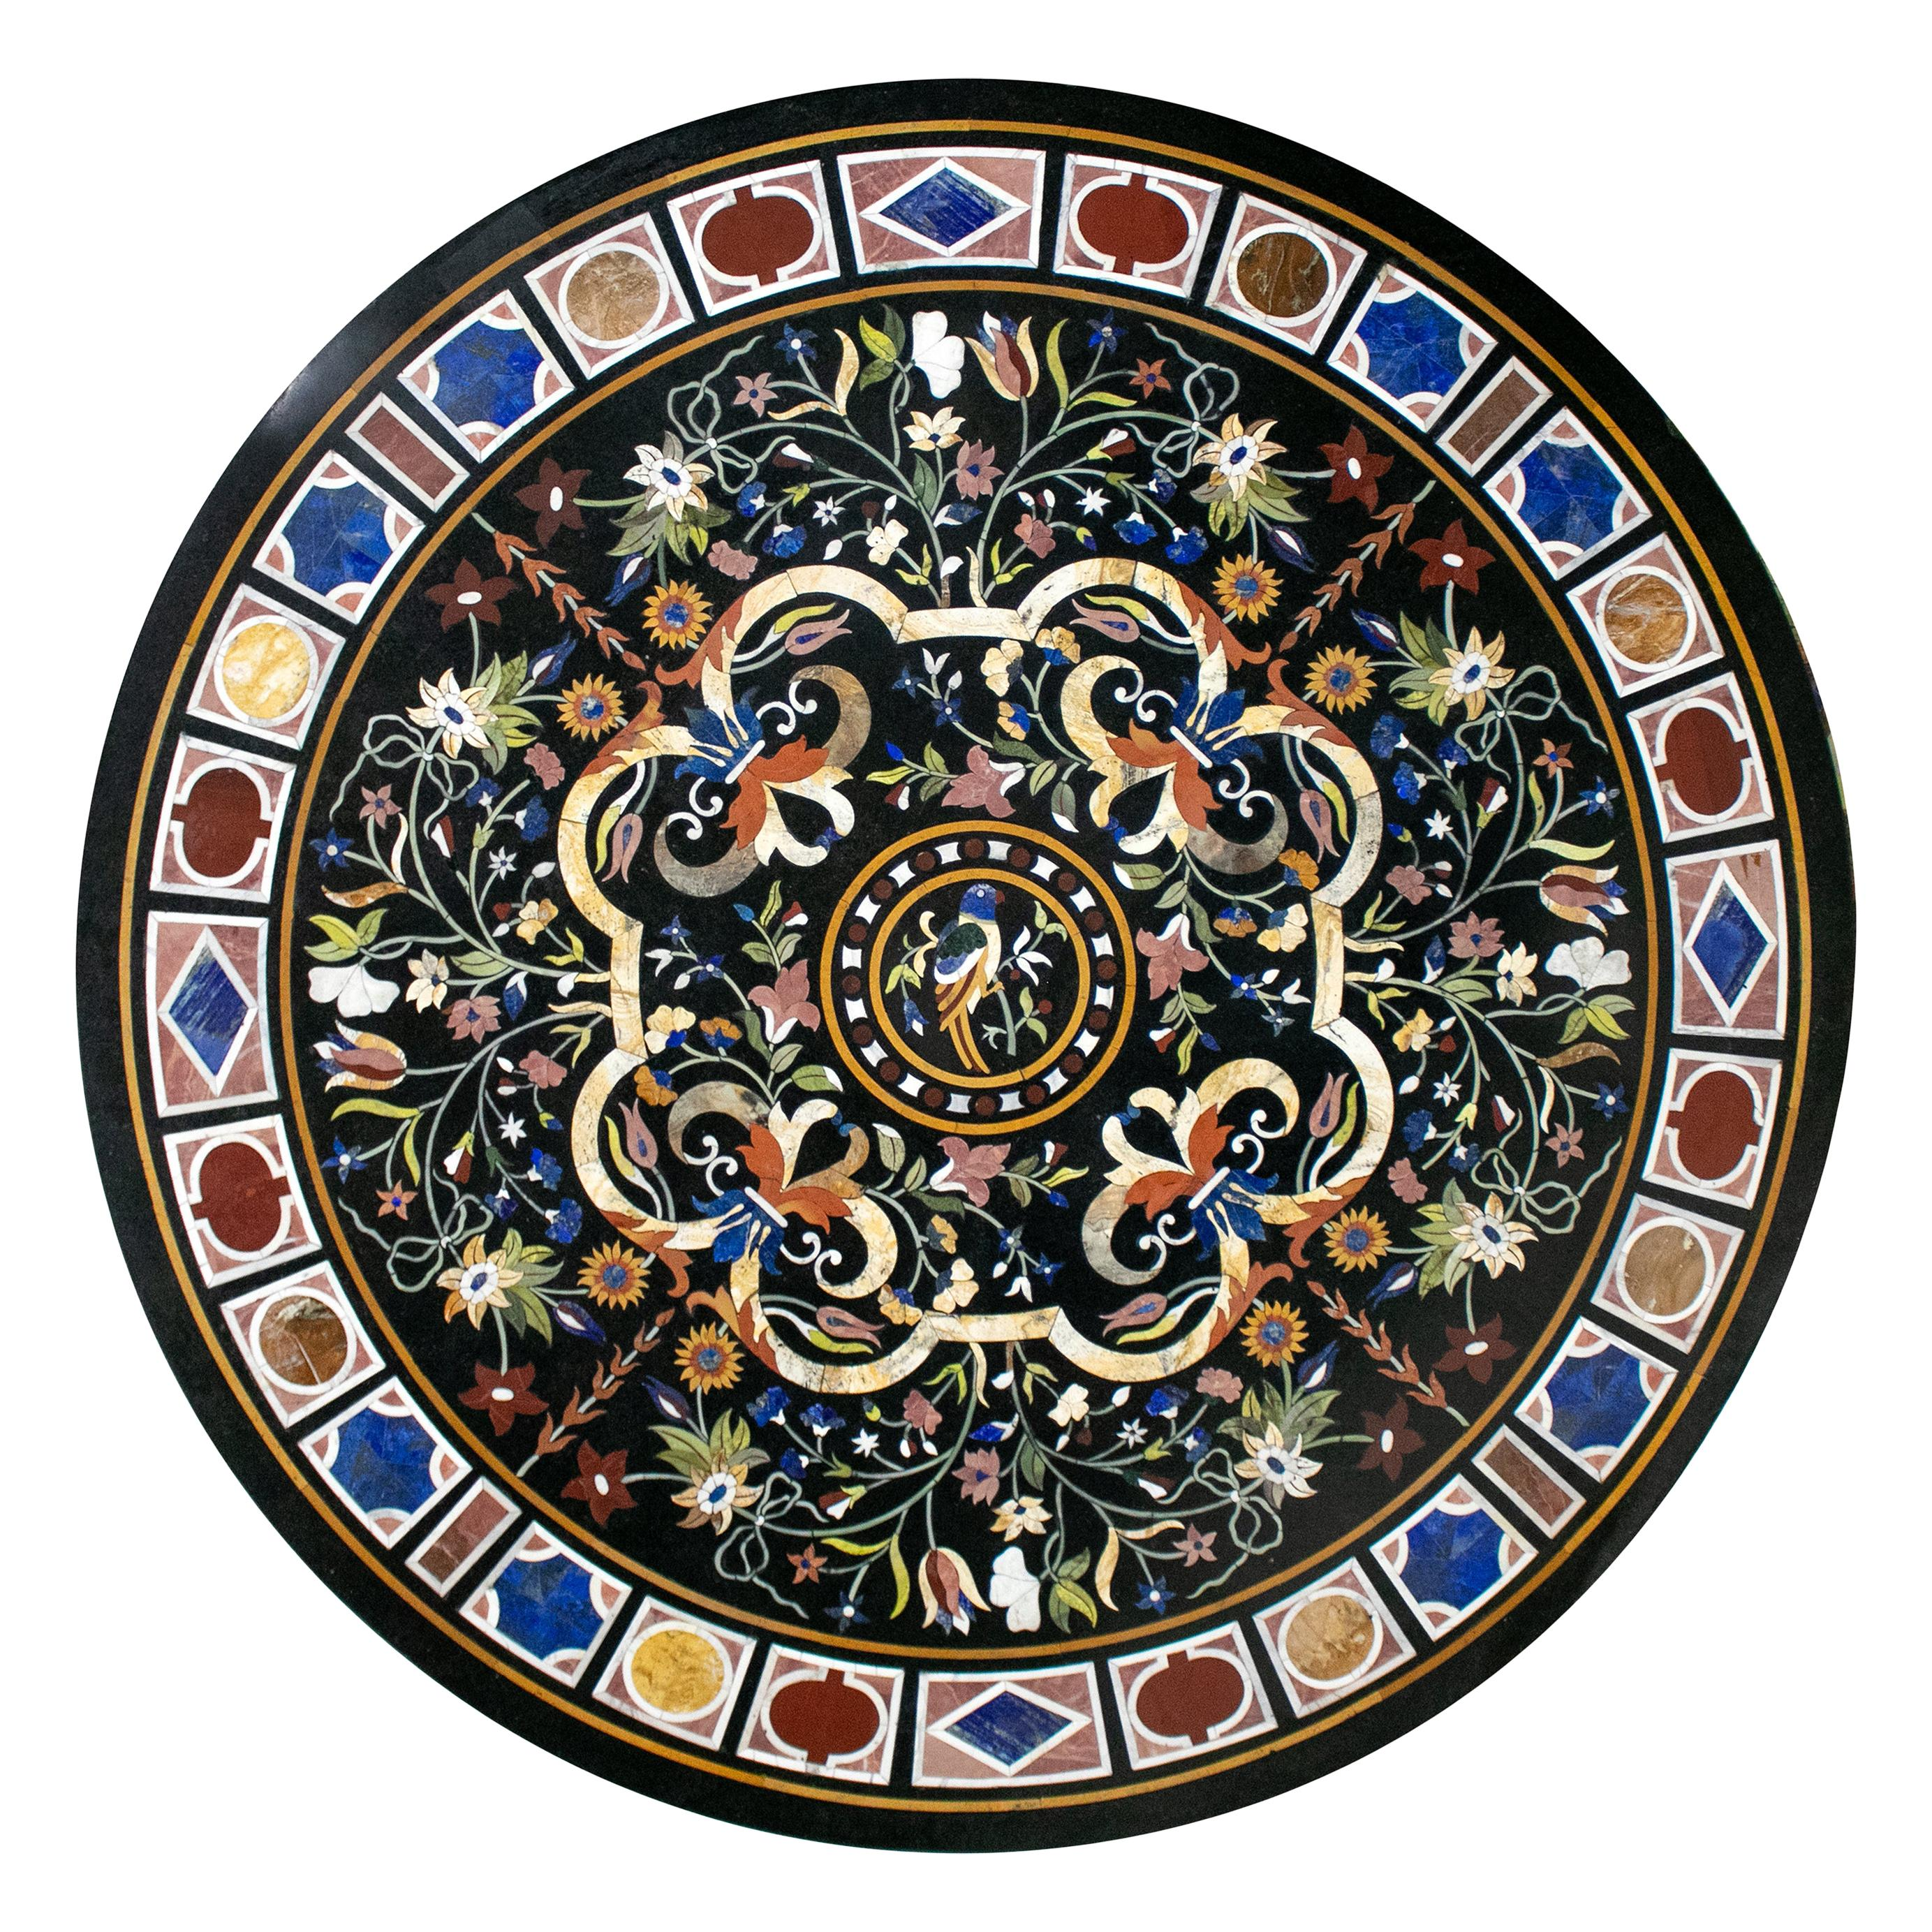 Classical Italian Pietra Dura Stone Mosaic Black Marble Round Table Top